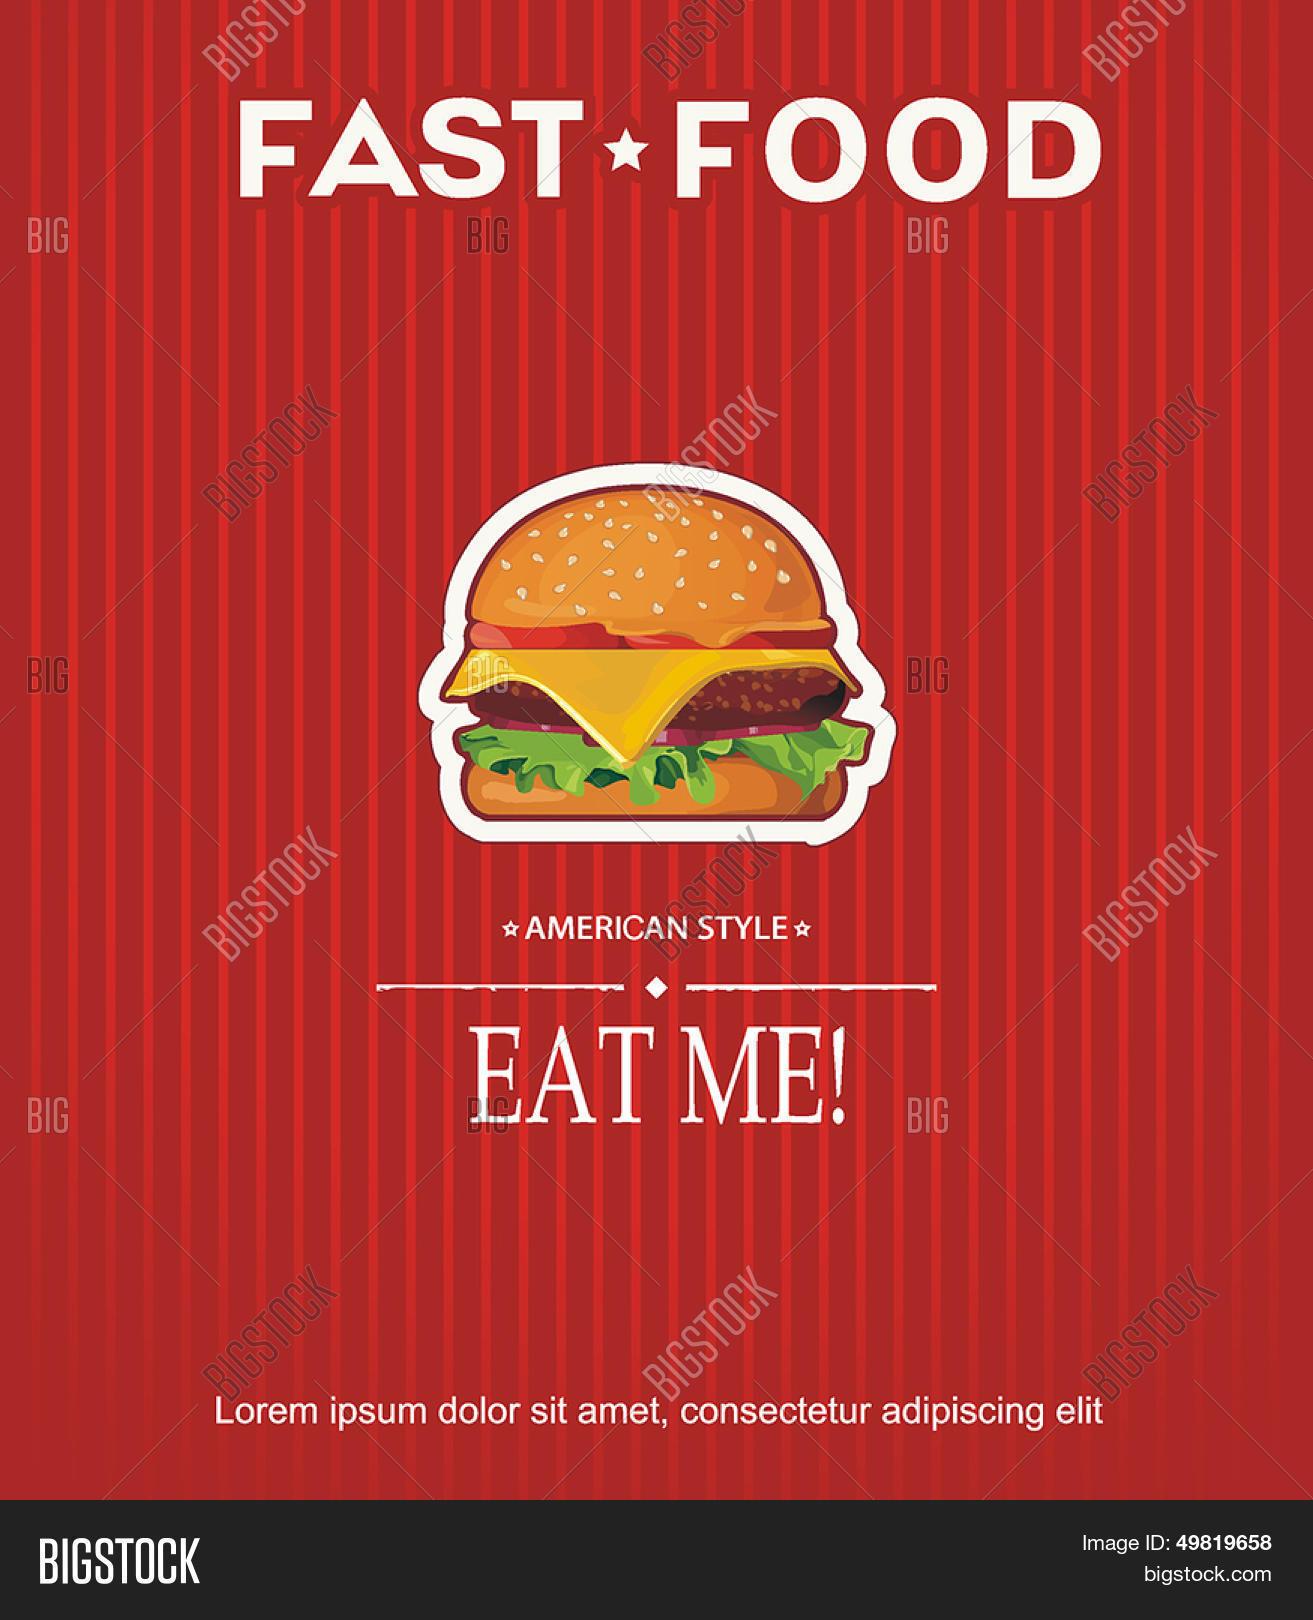 restaurant fast food vector photo free trial bigstock